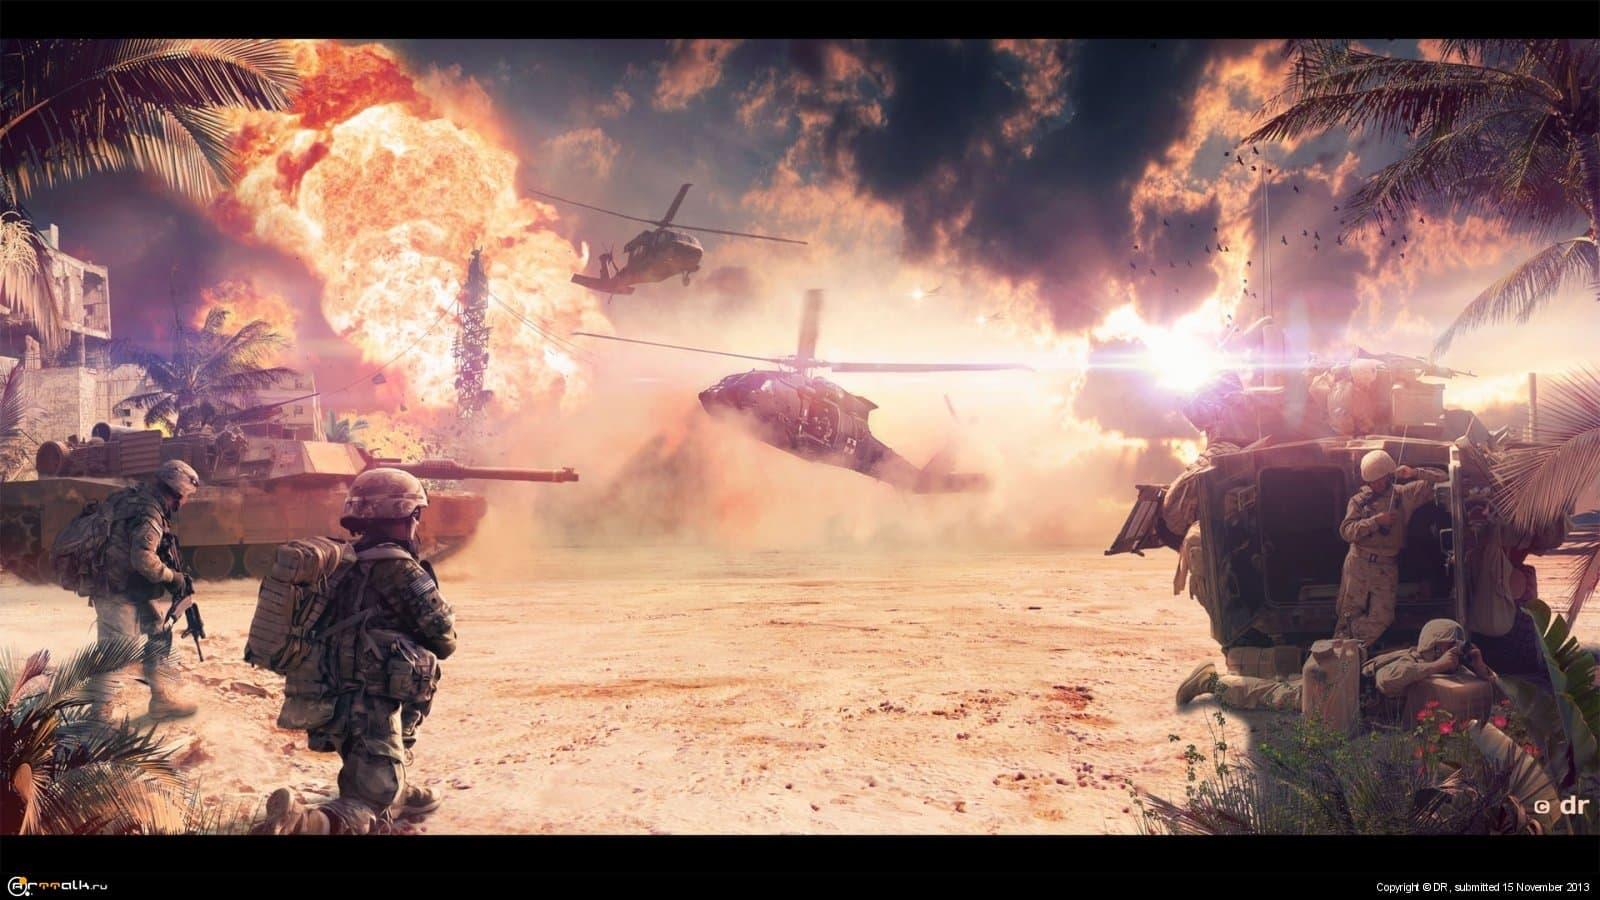 Battlefield // Операция Гильотина